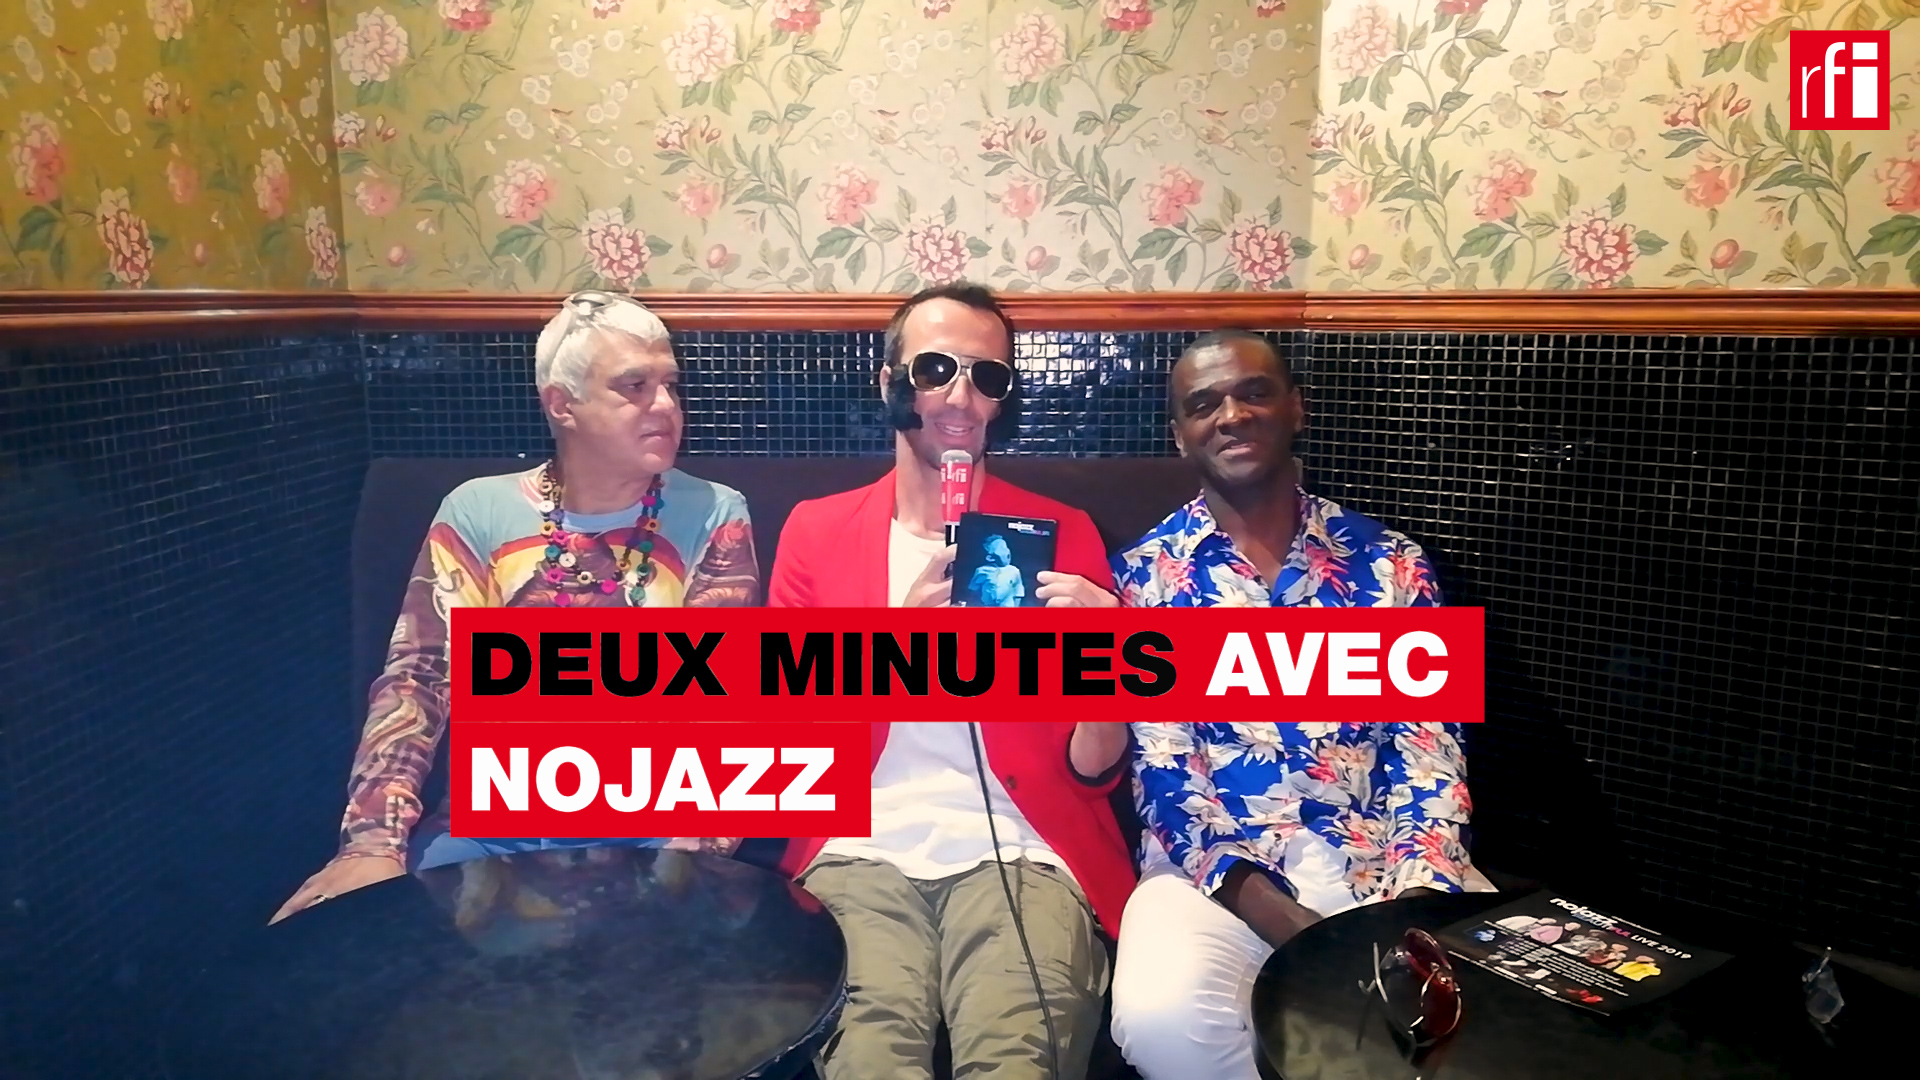 Deux minutes avec NoJazz